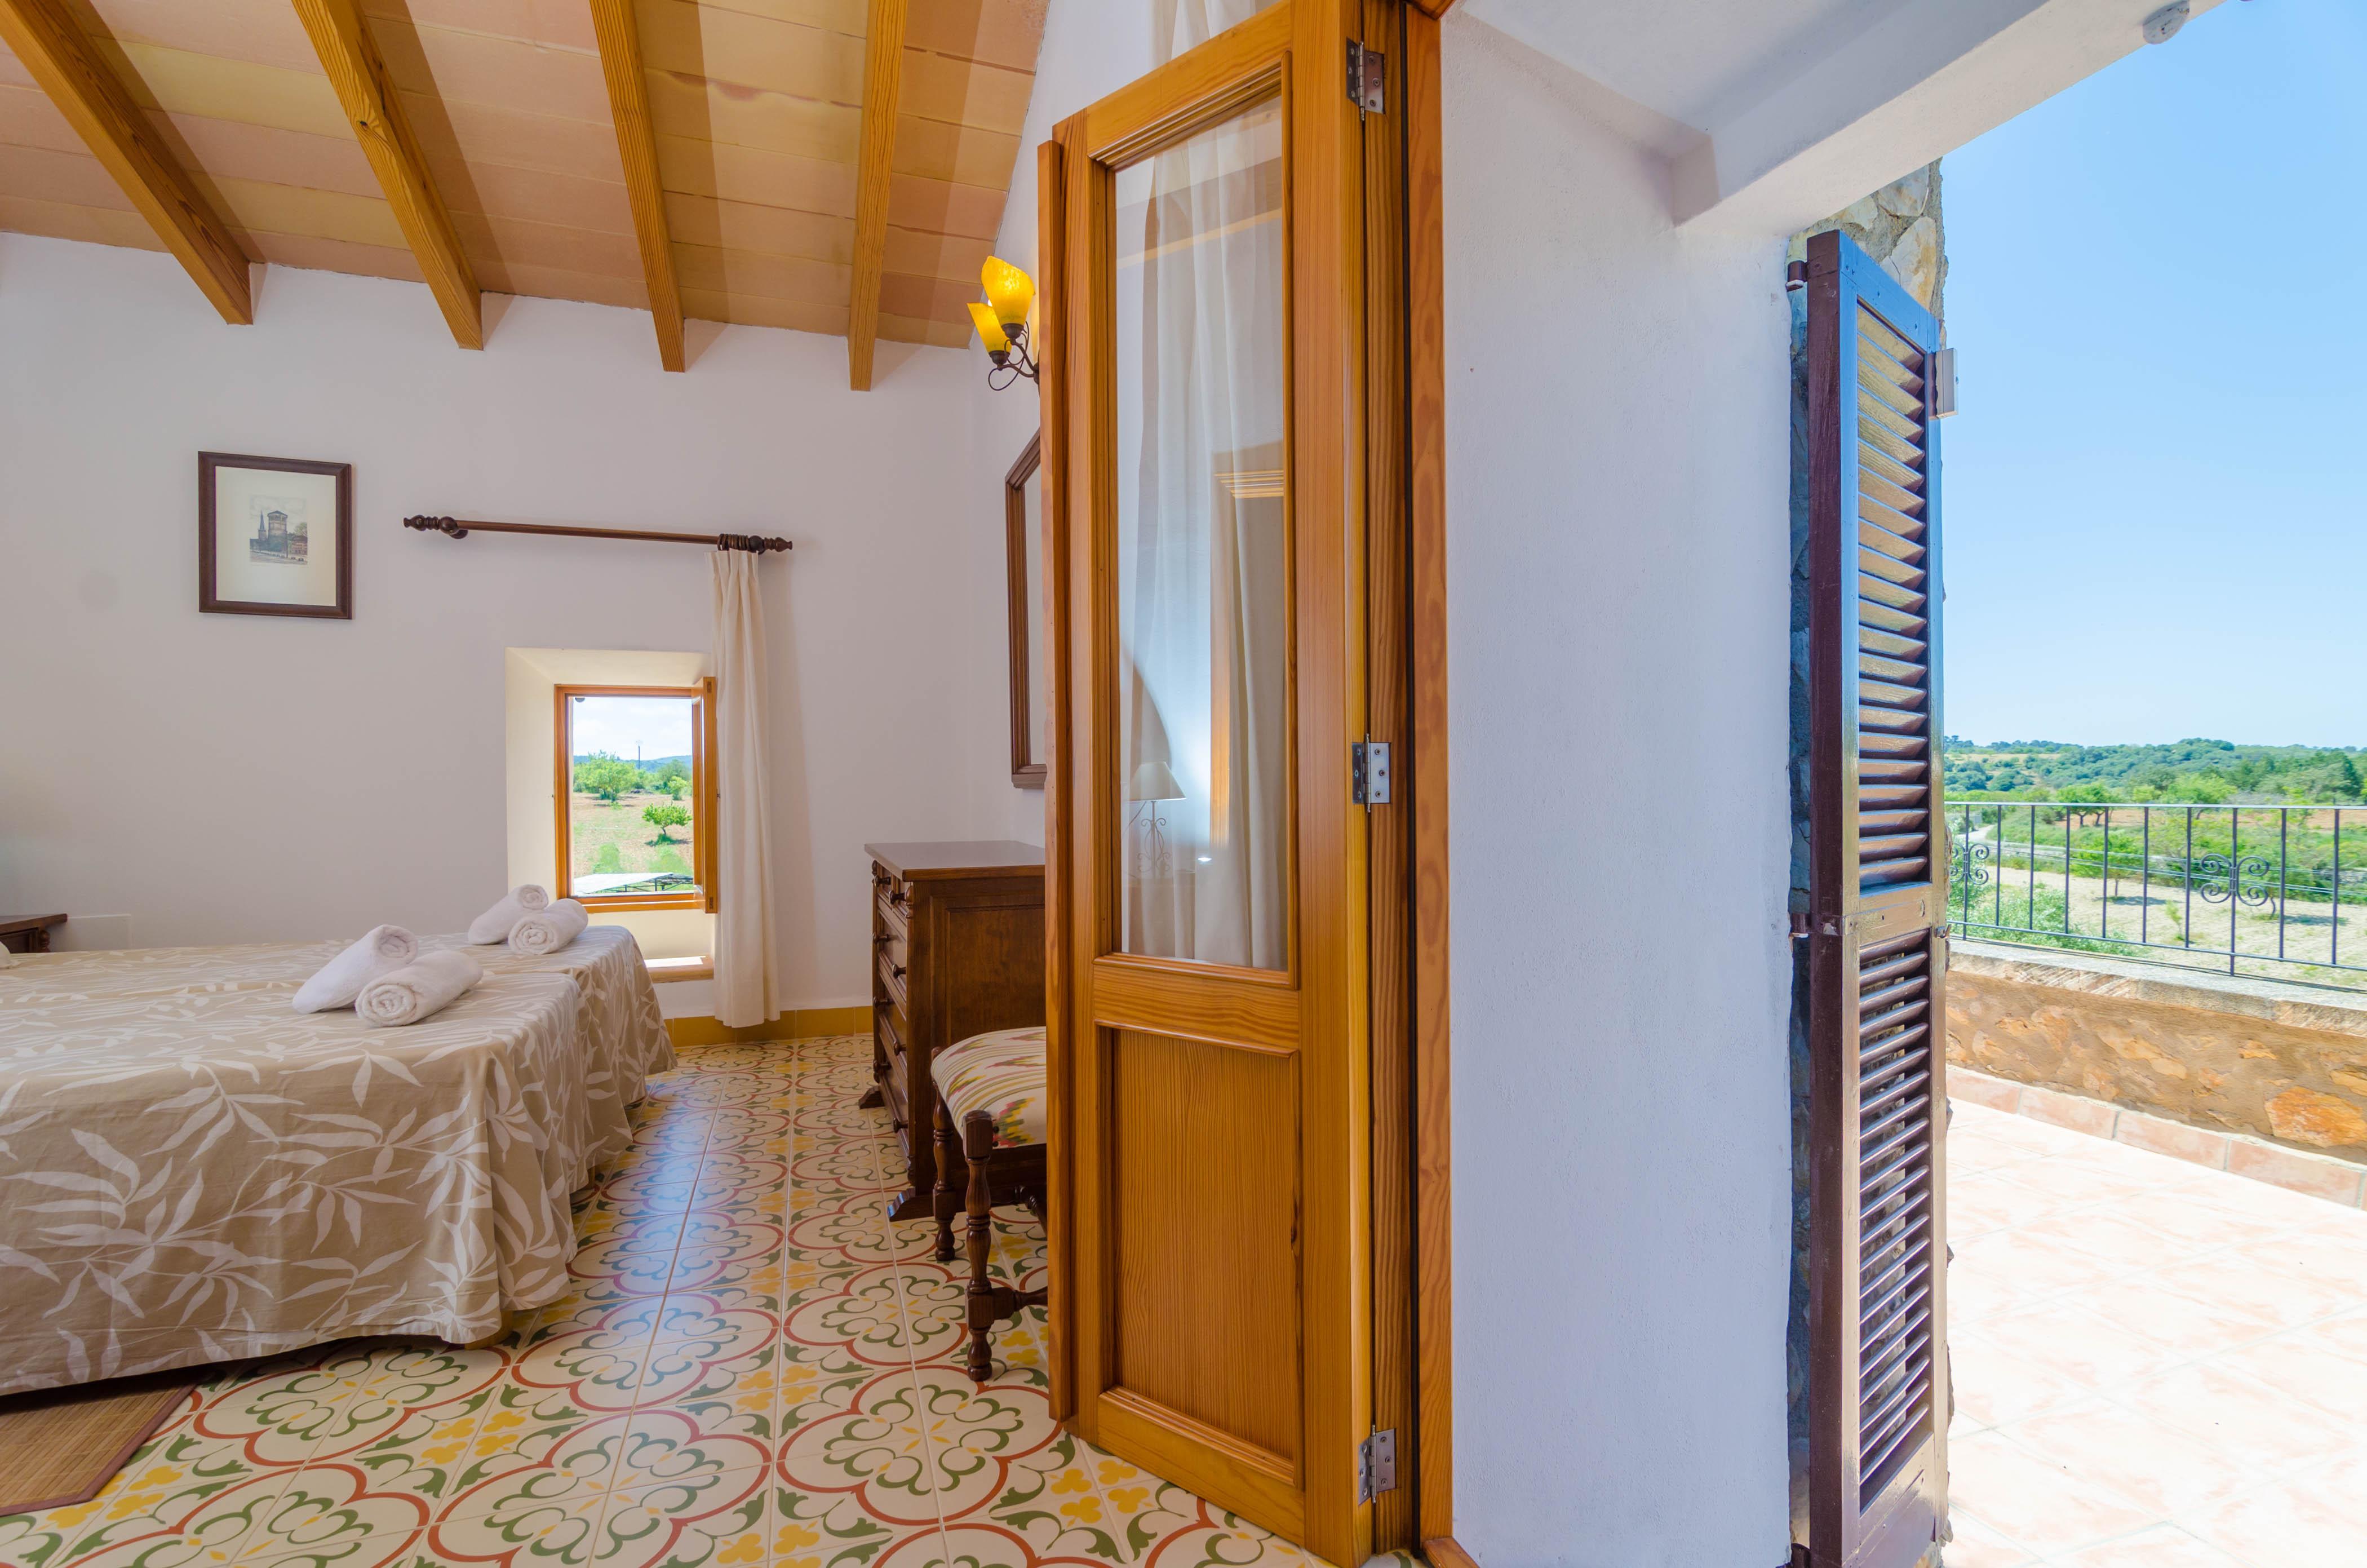 Ferienhaus SON MACIA (2186582), Son Macià, Mallorca, Balearische Inseln, Spanien, Bild 45